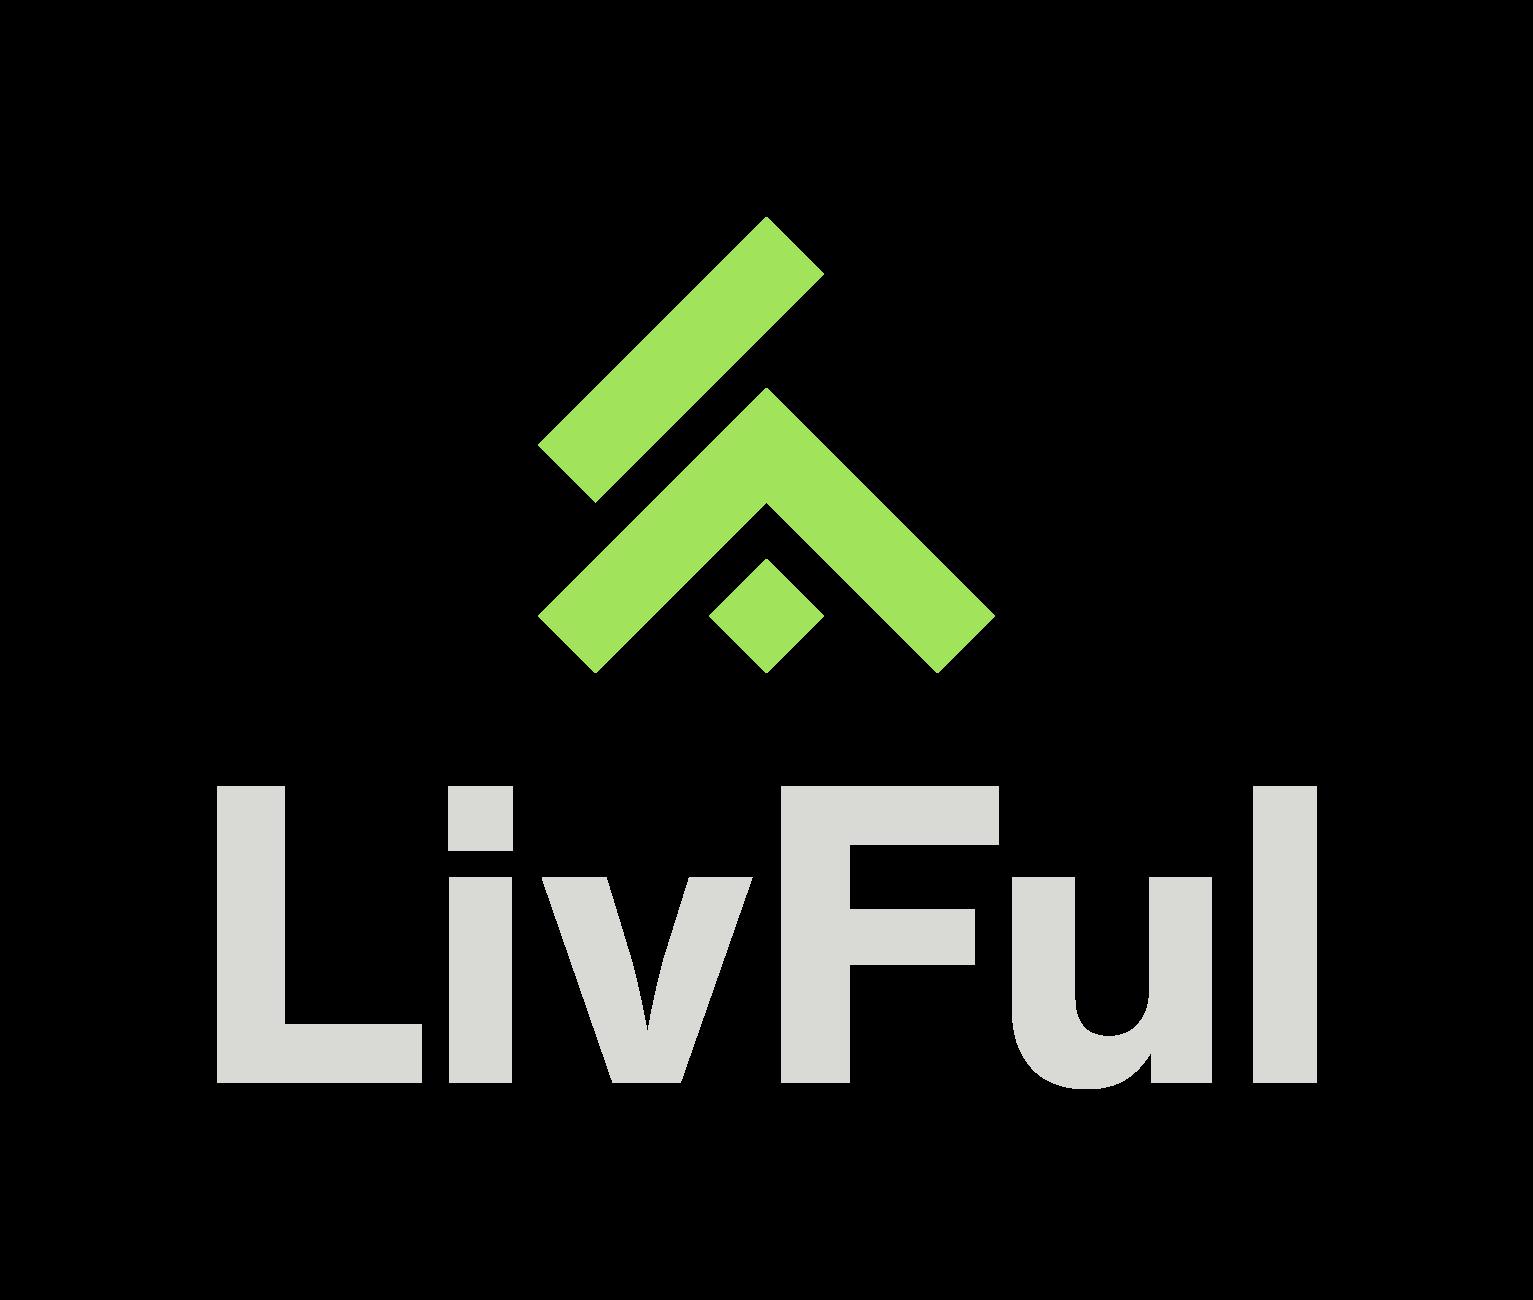 Livful_Symbol_RGB_Green.png